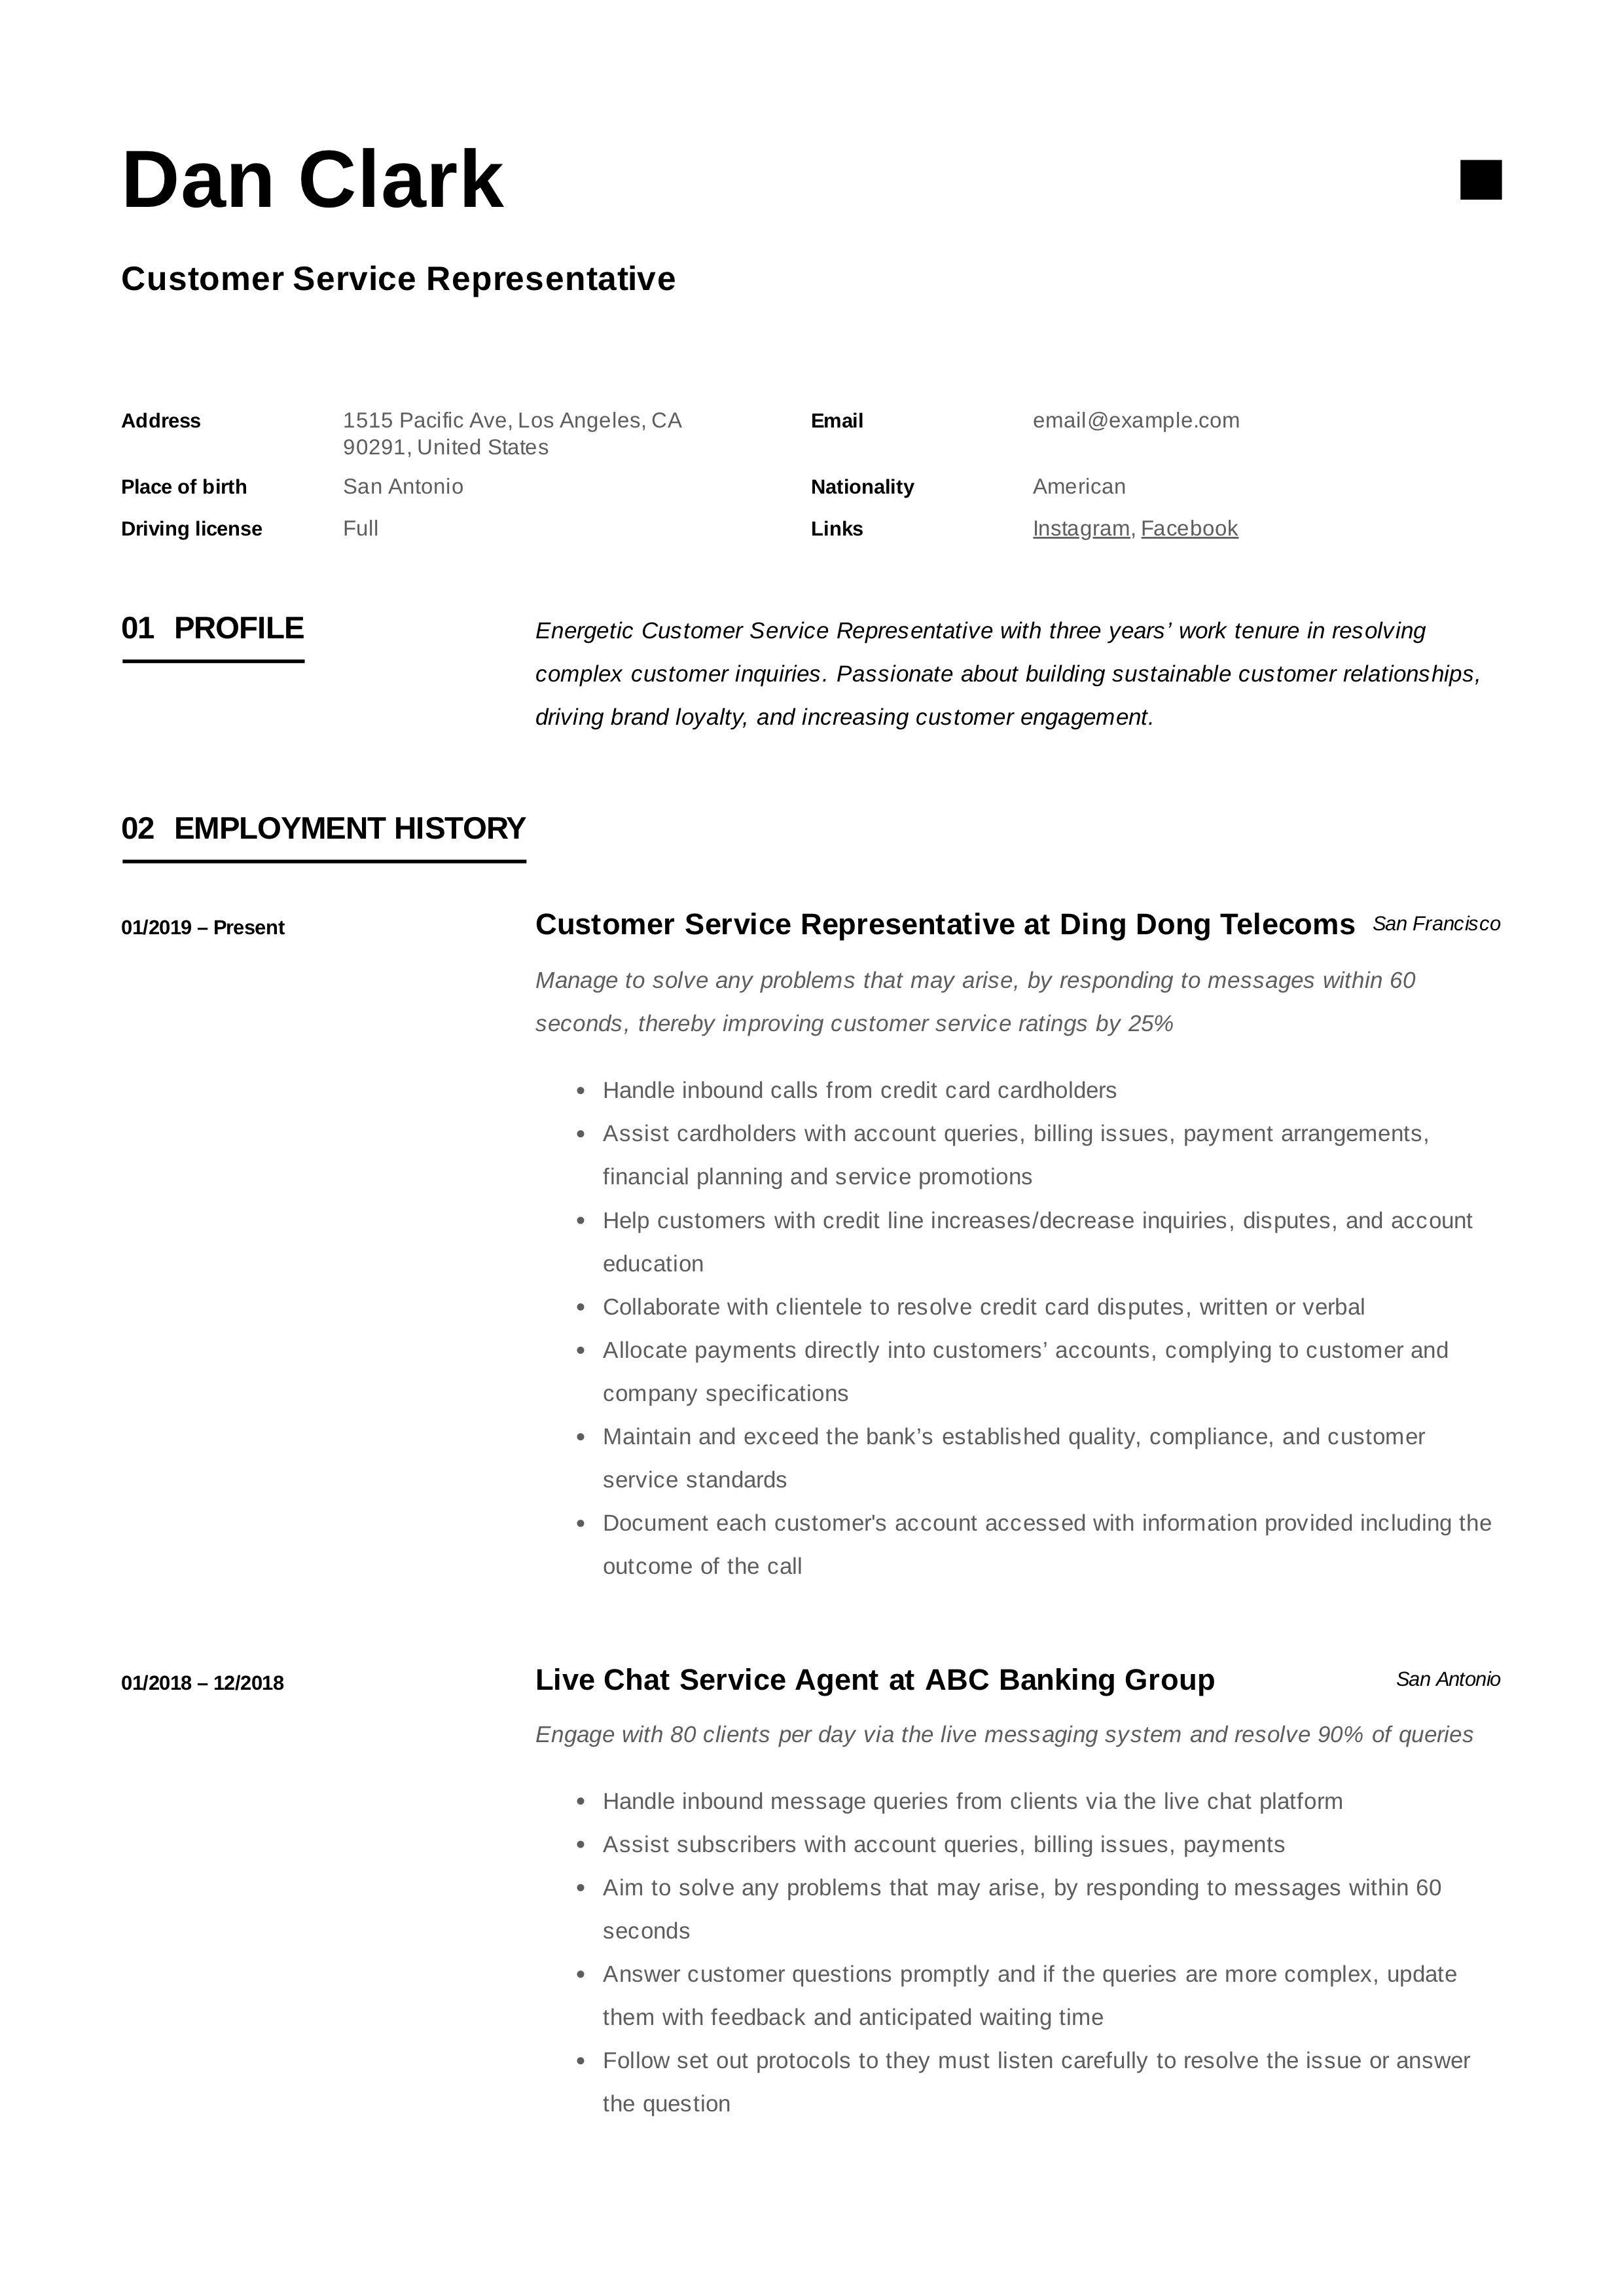 Customer service representative resume louiesportsmouth